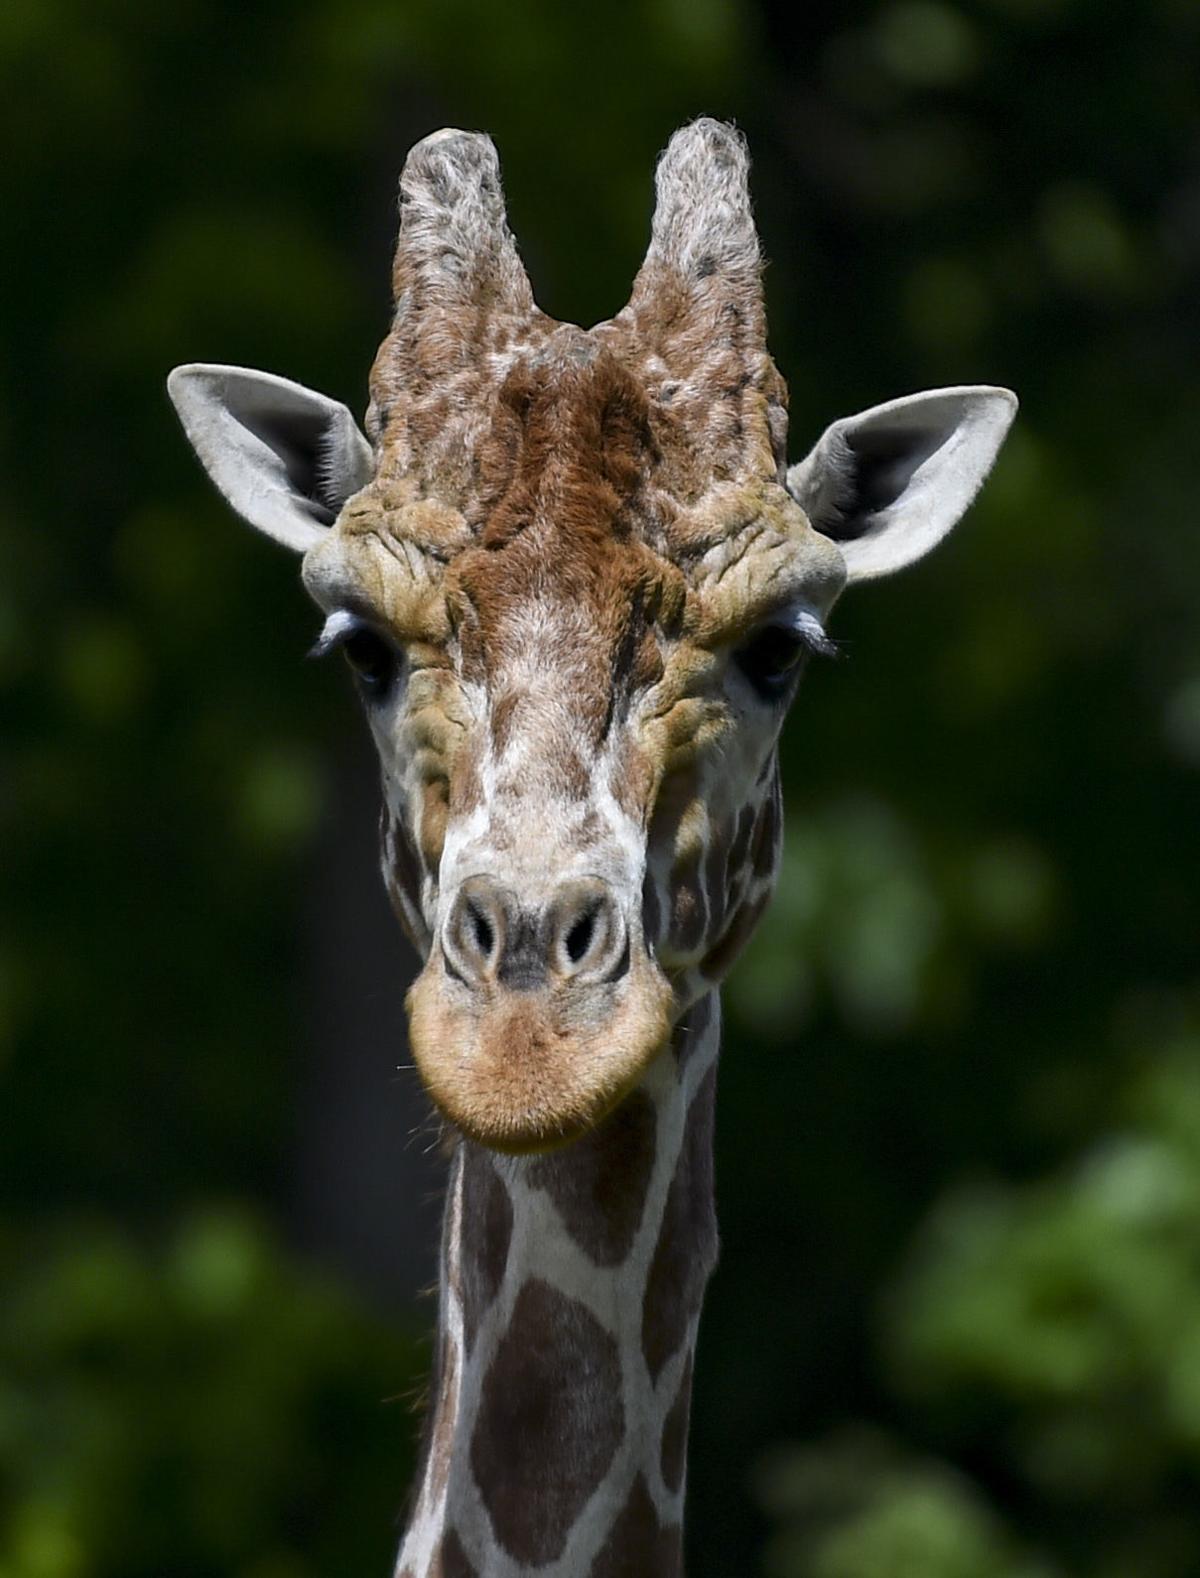 060619-mda-nws-giraffes-7.jpg